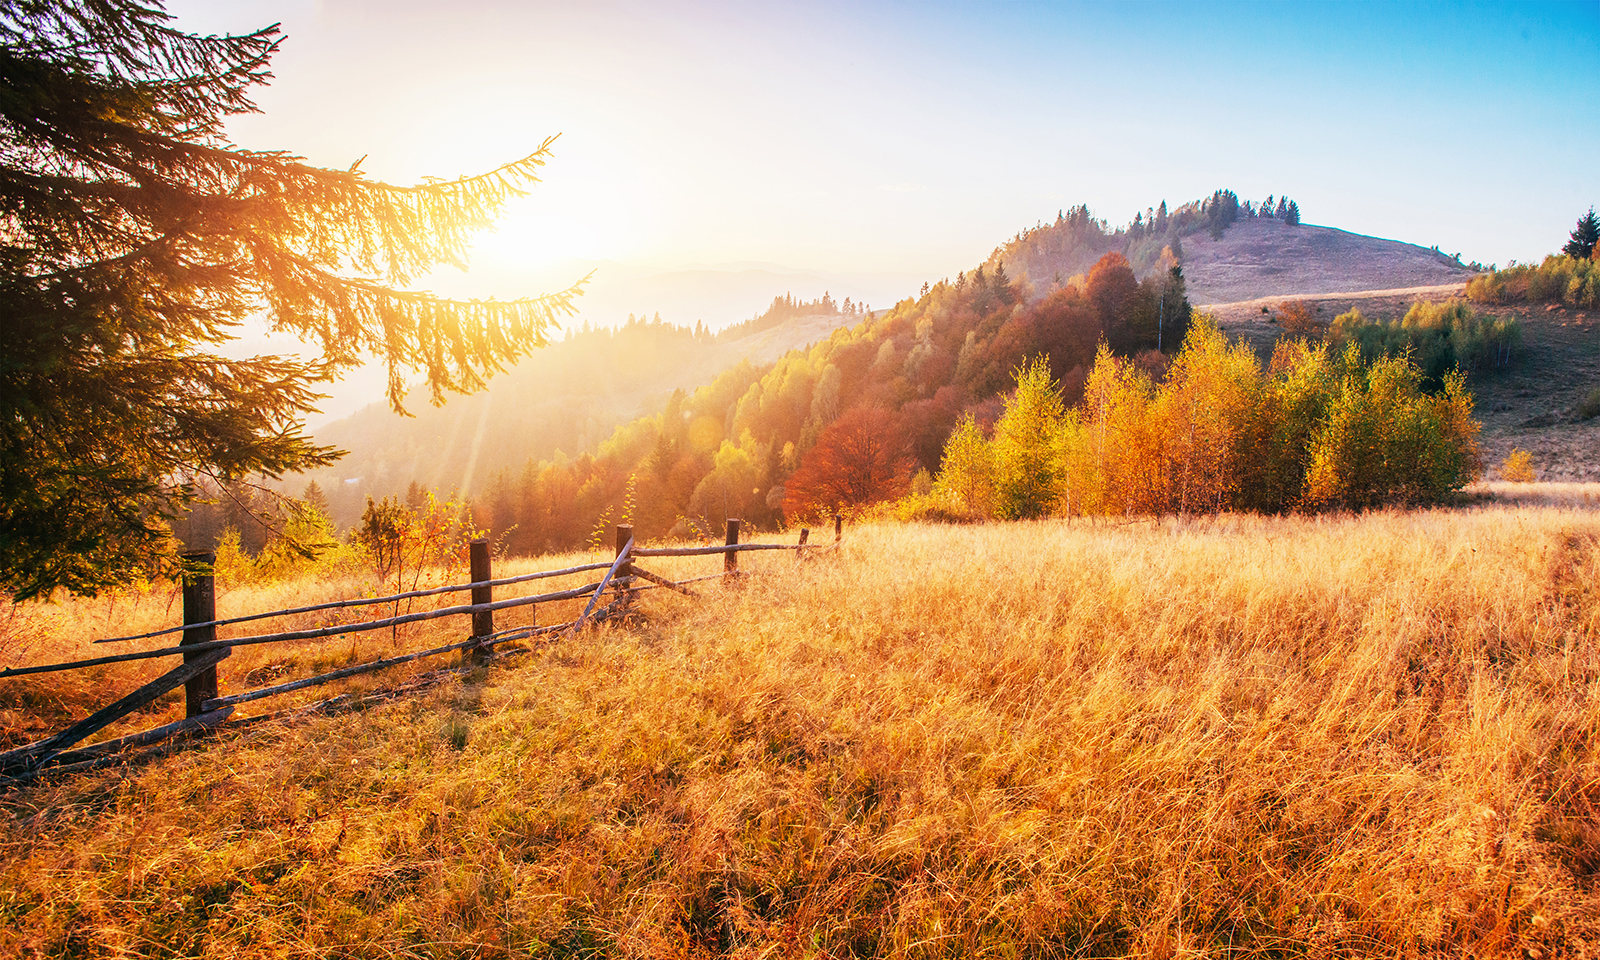 beautiful-mountainside-with-golden-grass-during-beautiful-sunset